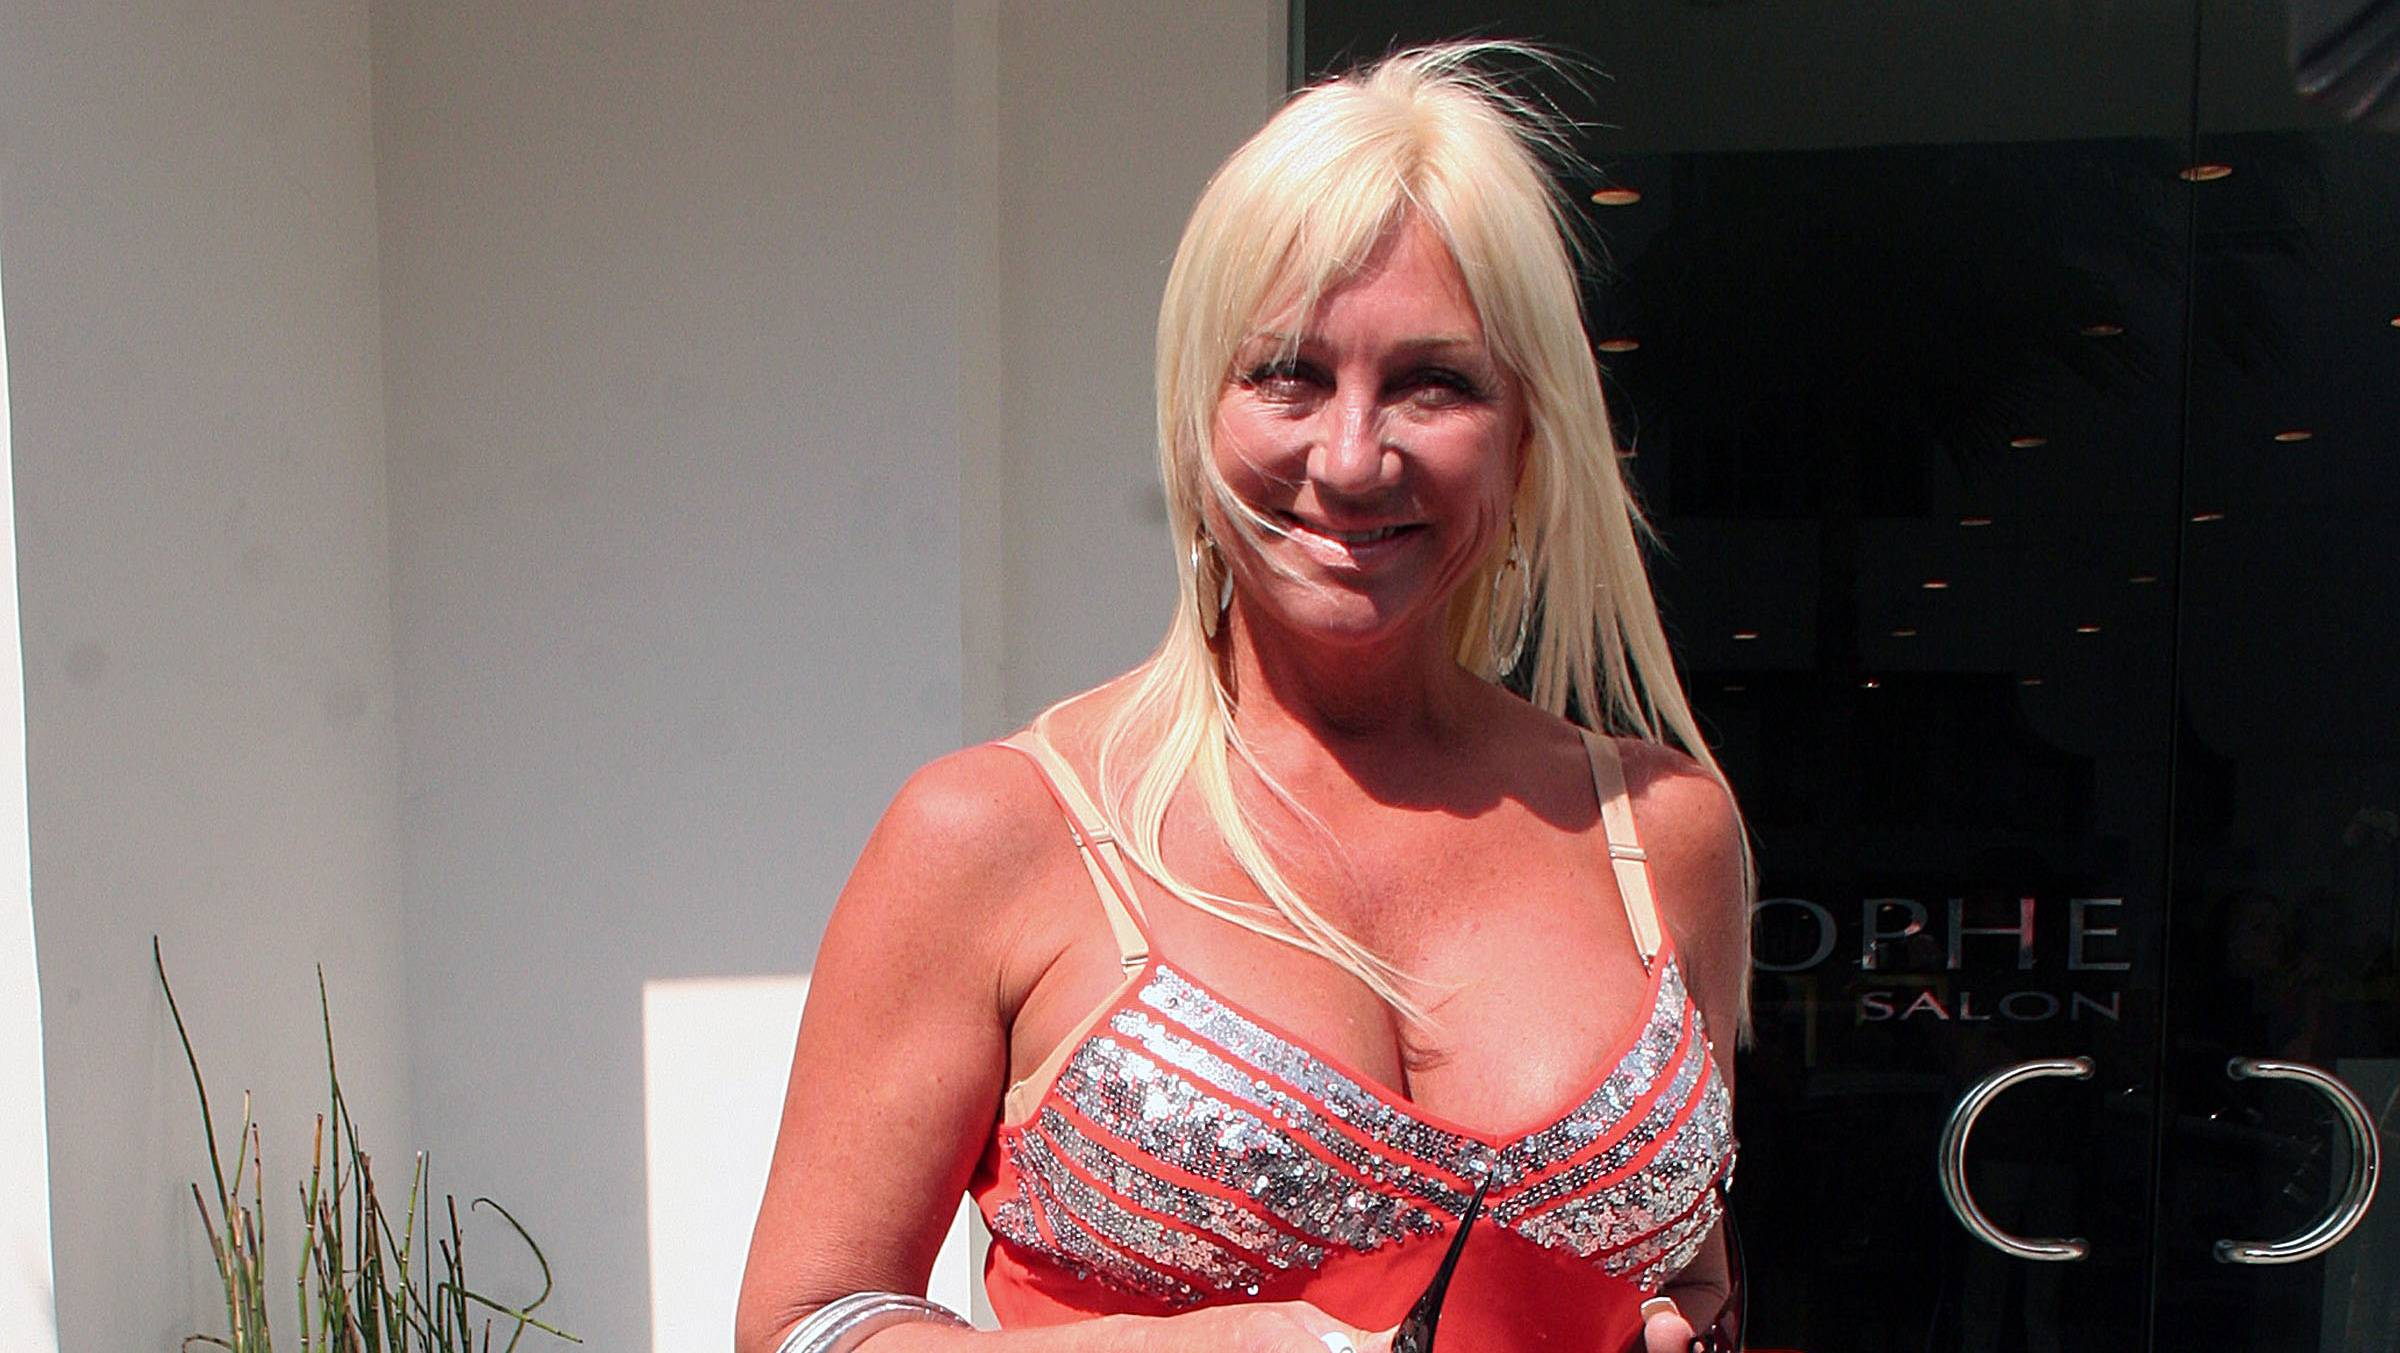 Linda Hogan naked (74 pics), foto Topless, Instagram, butt 2018